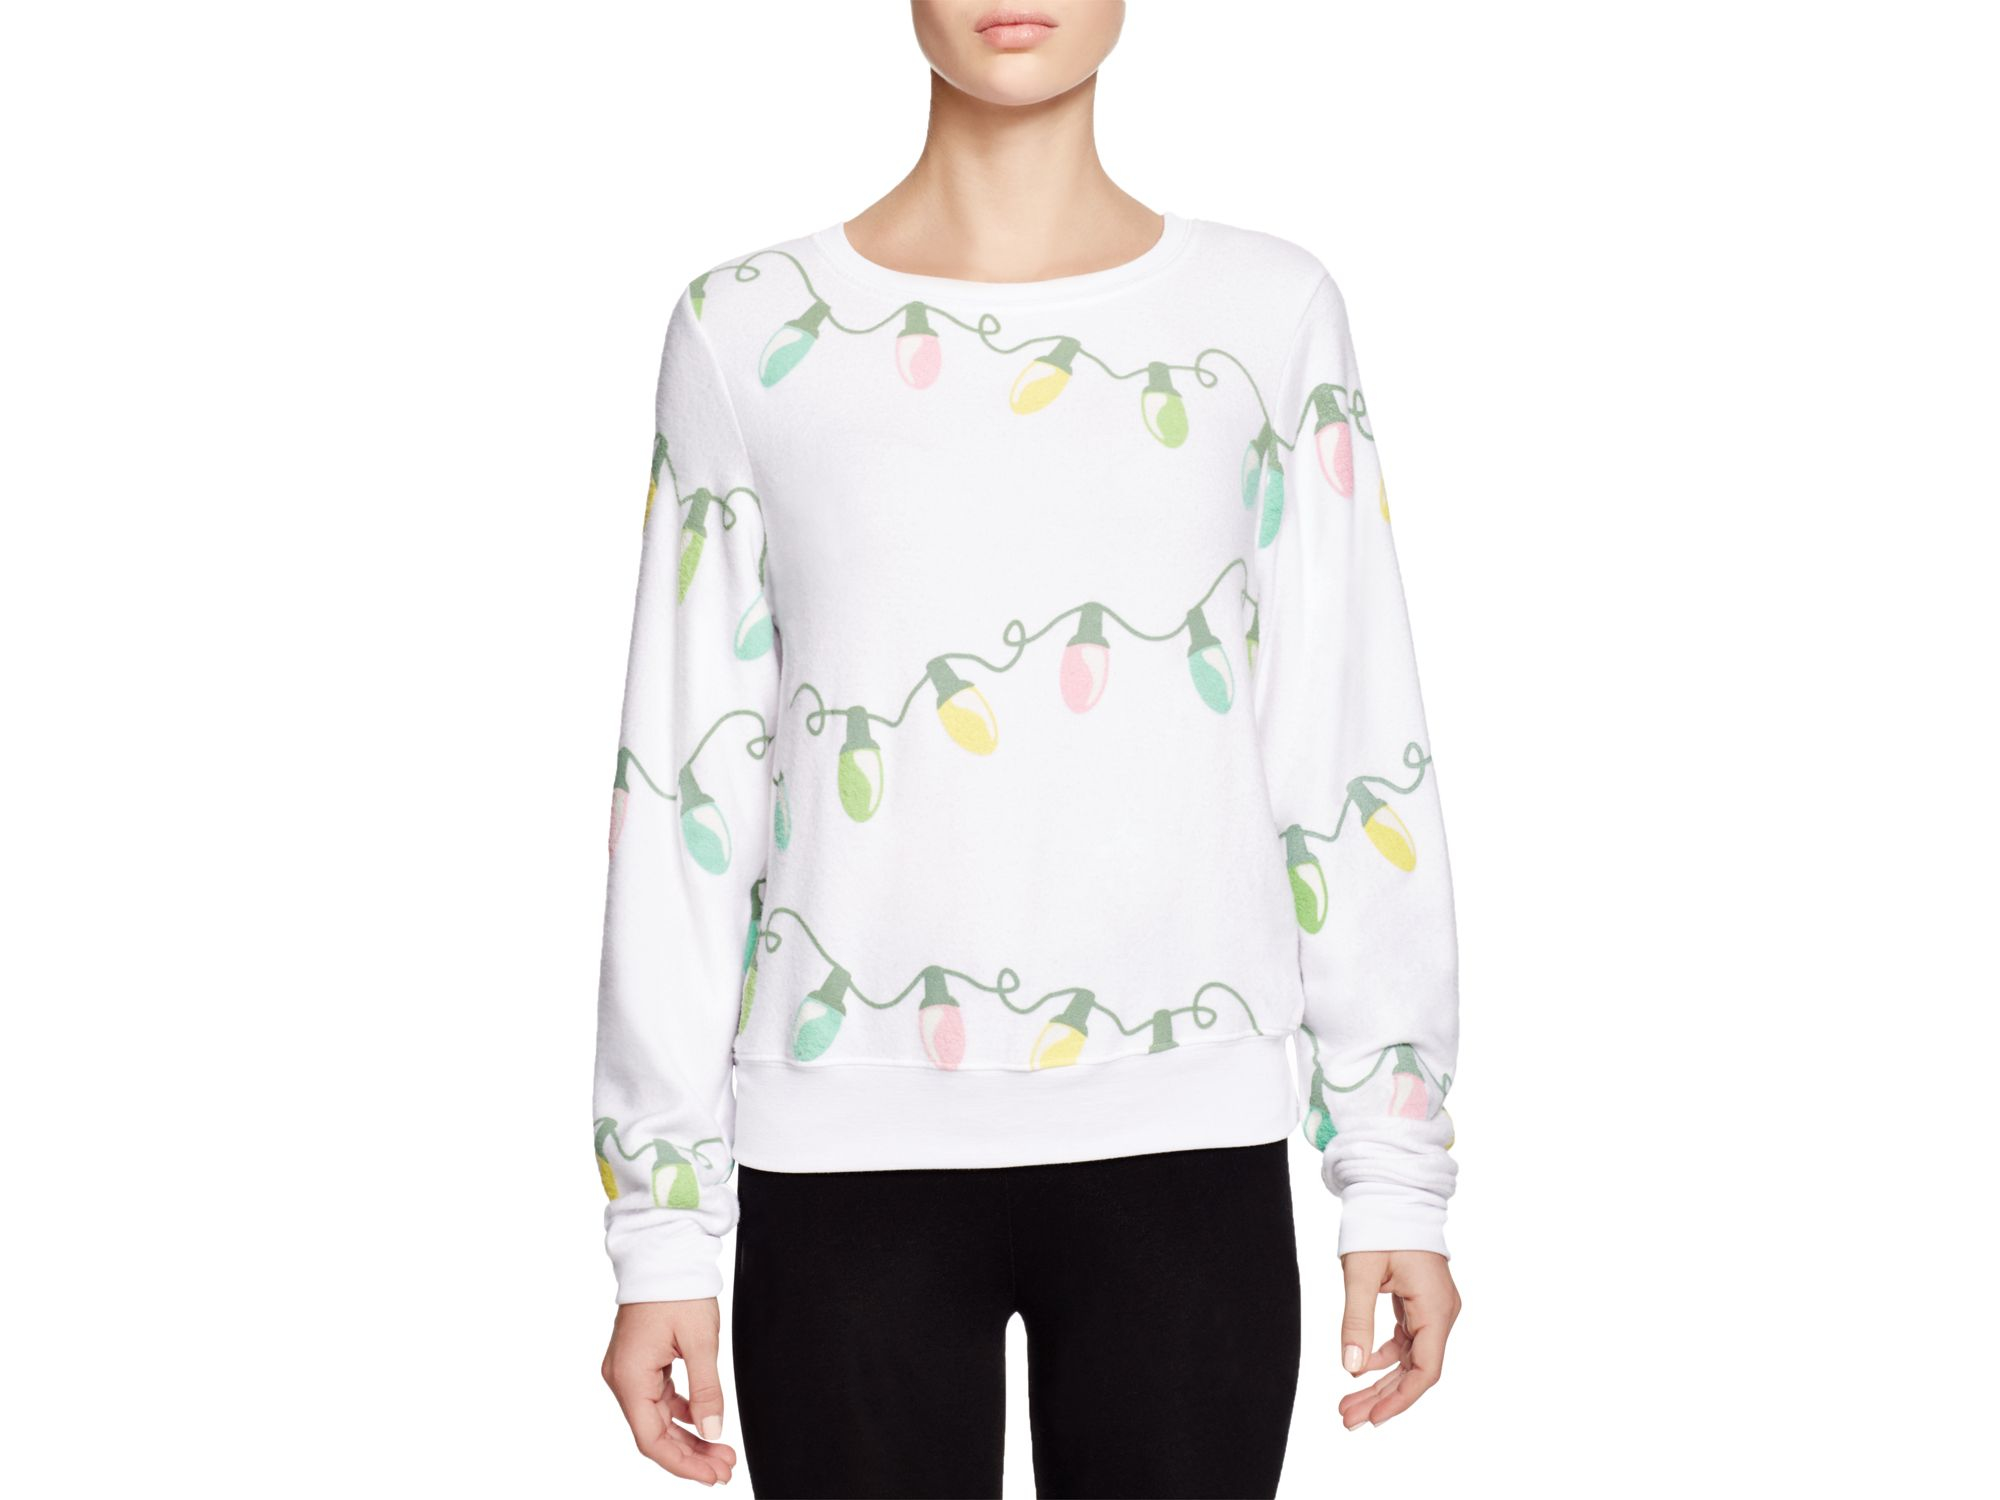 Lyst - Wildfox Glowing Lights Sweatshirt in White